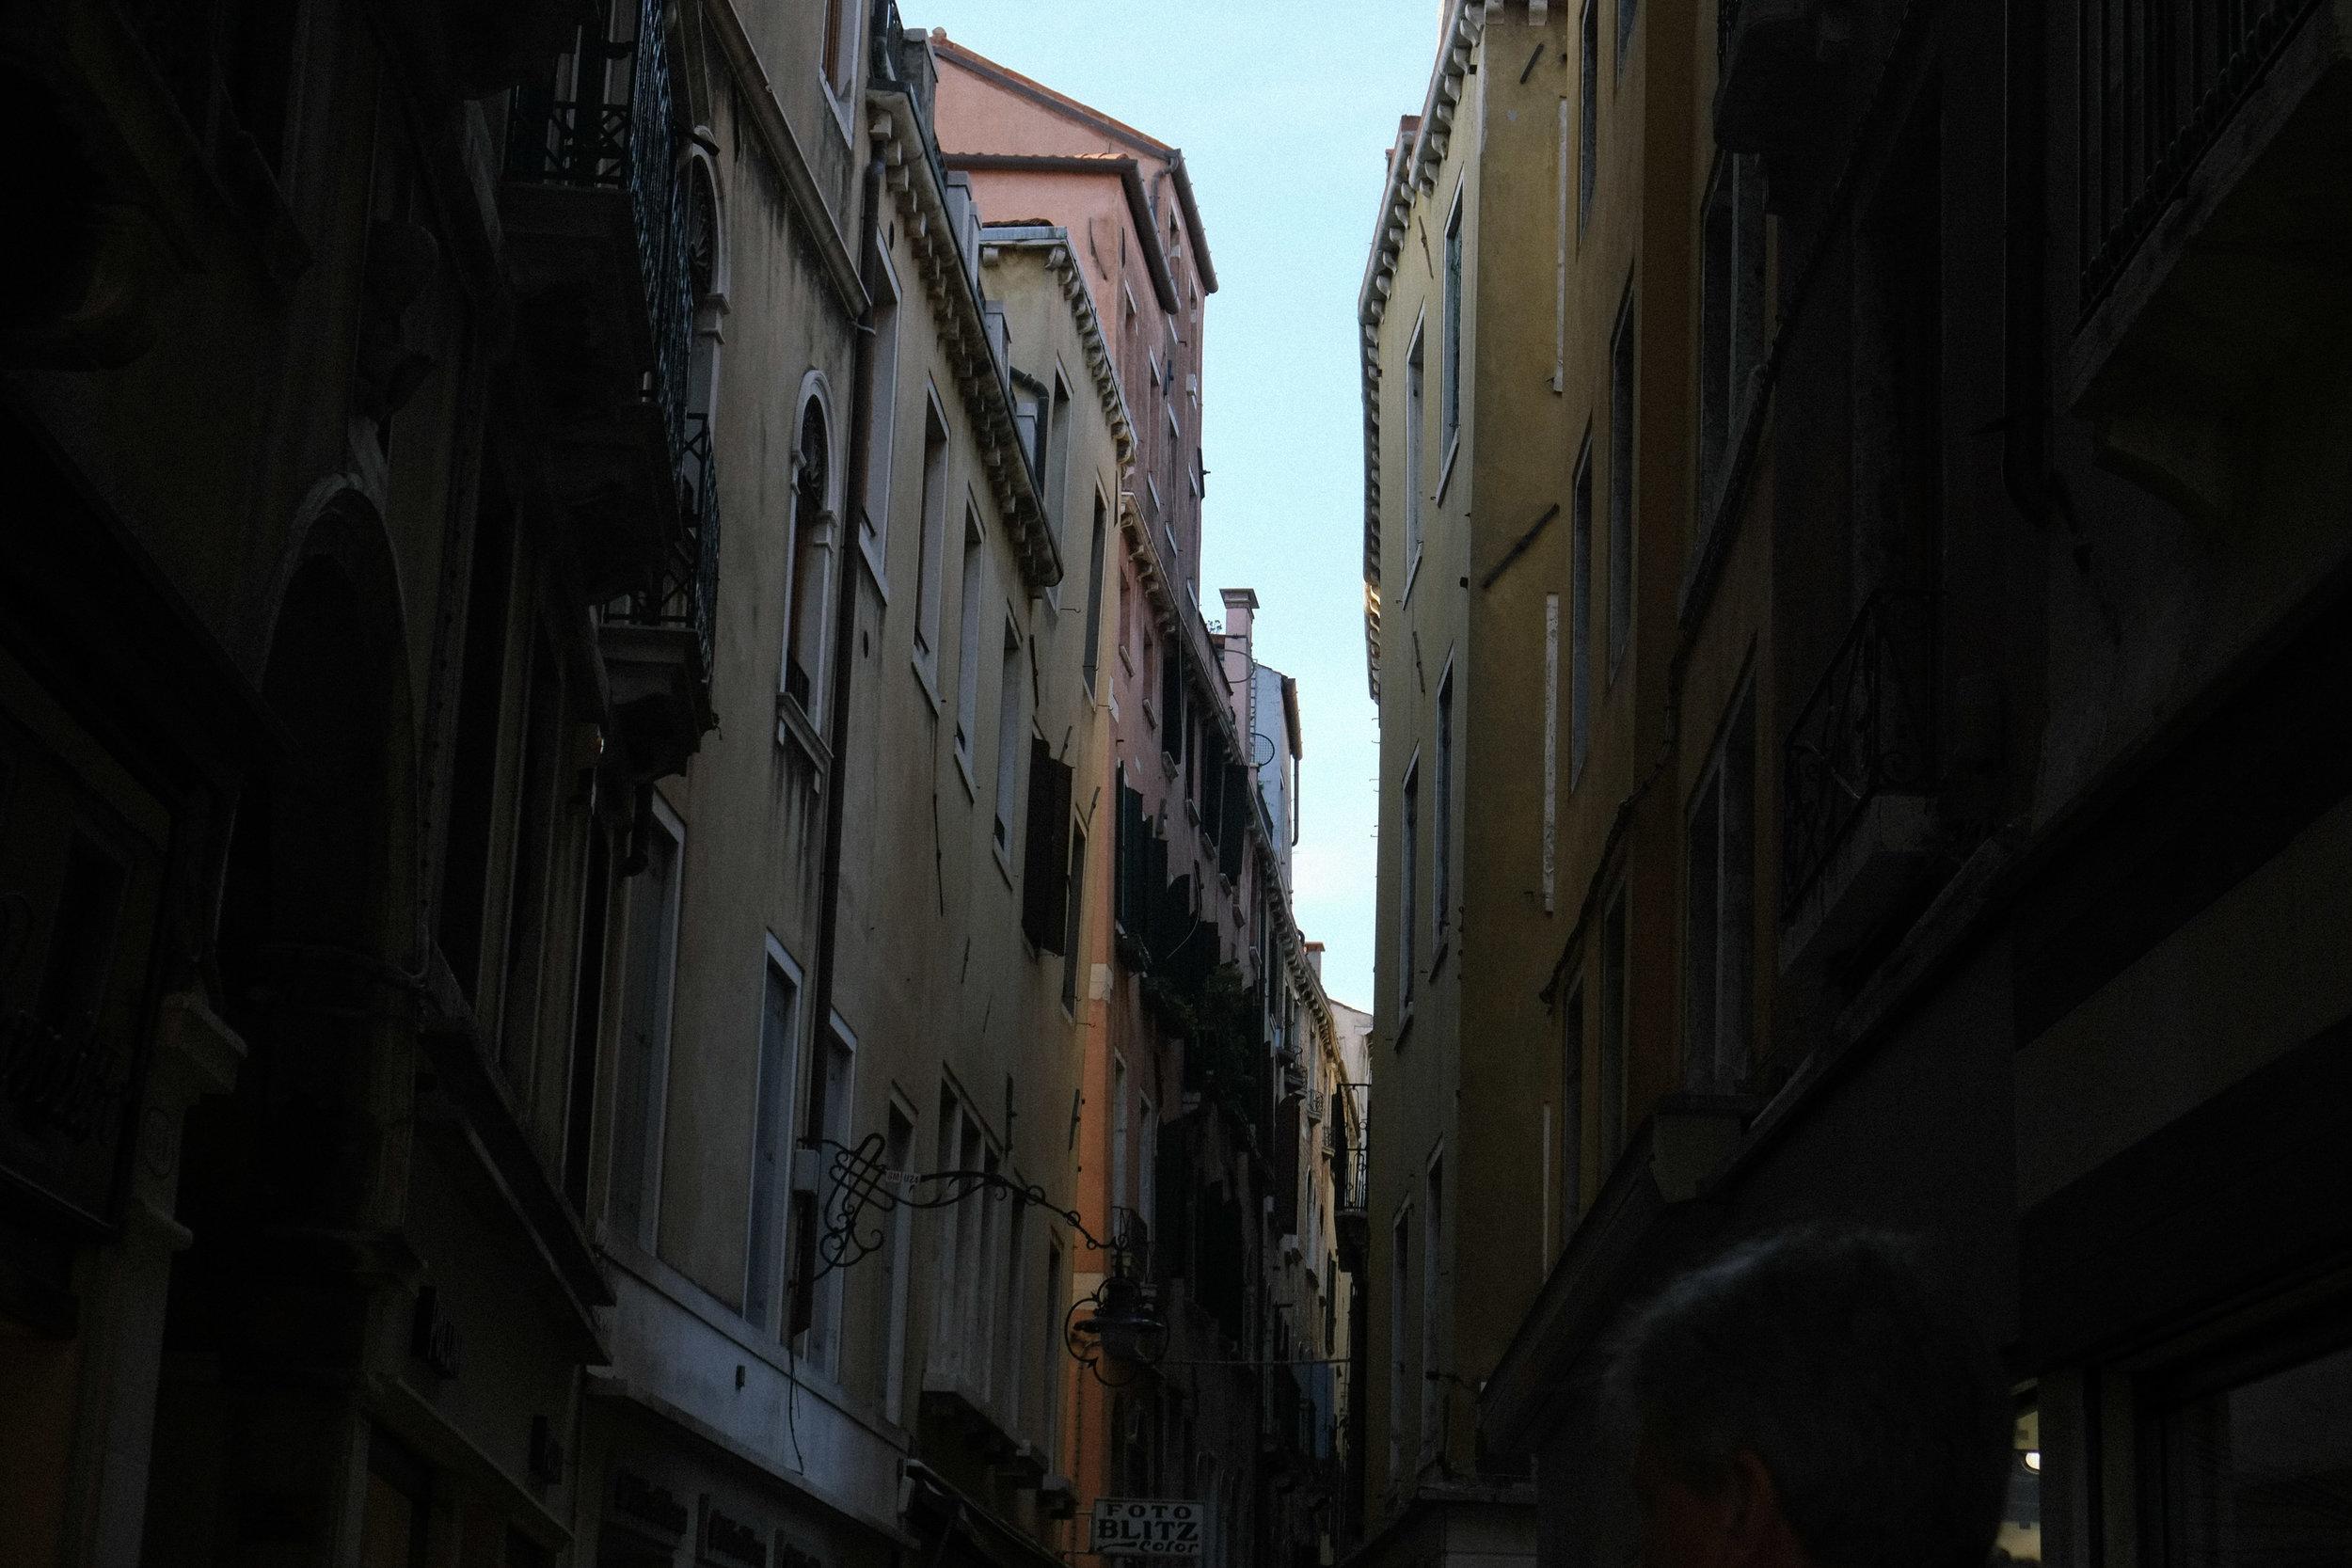 Lesly Lotha_Venice_Italy 13.jpg